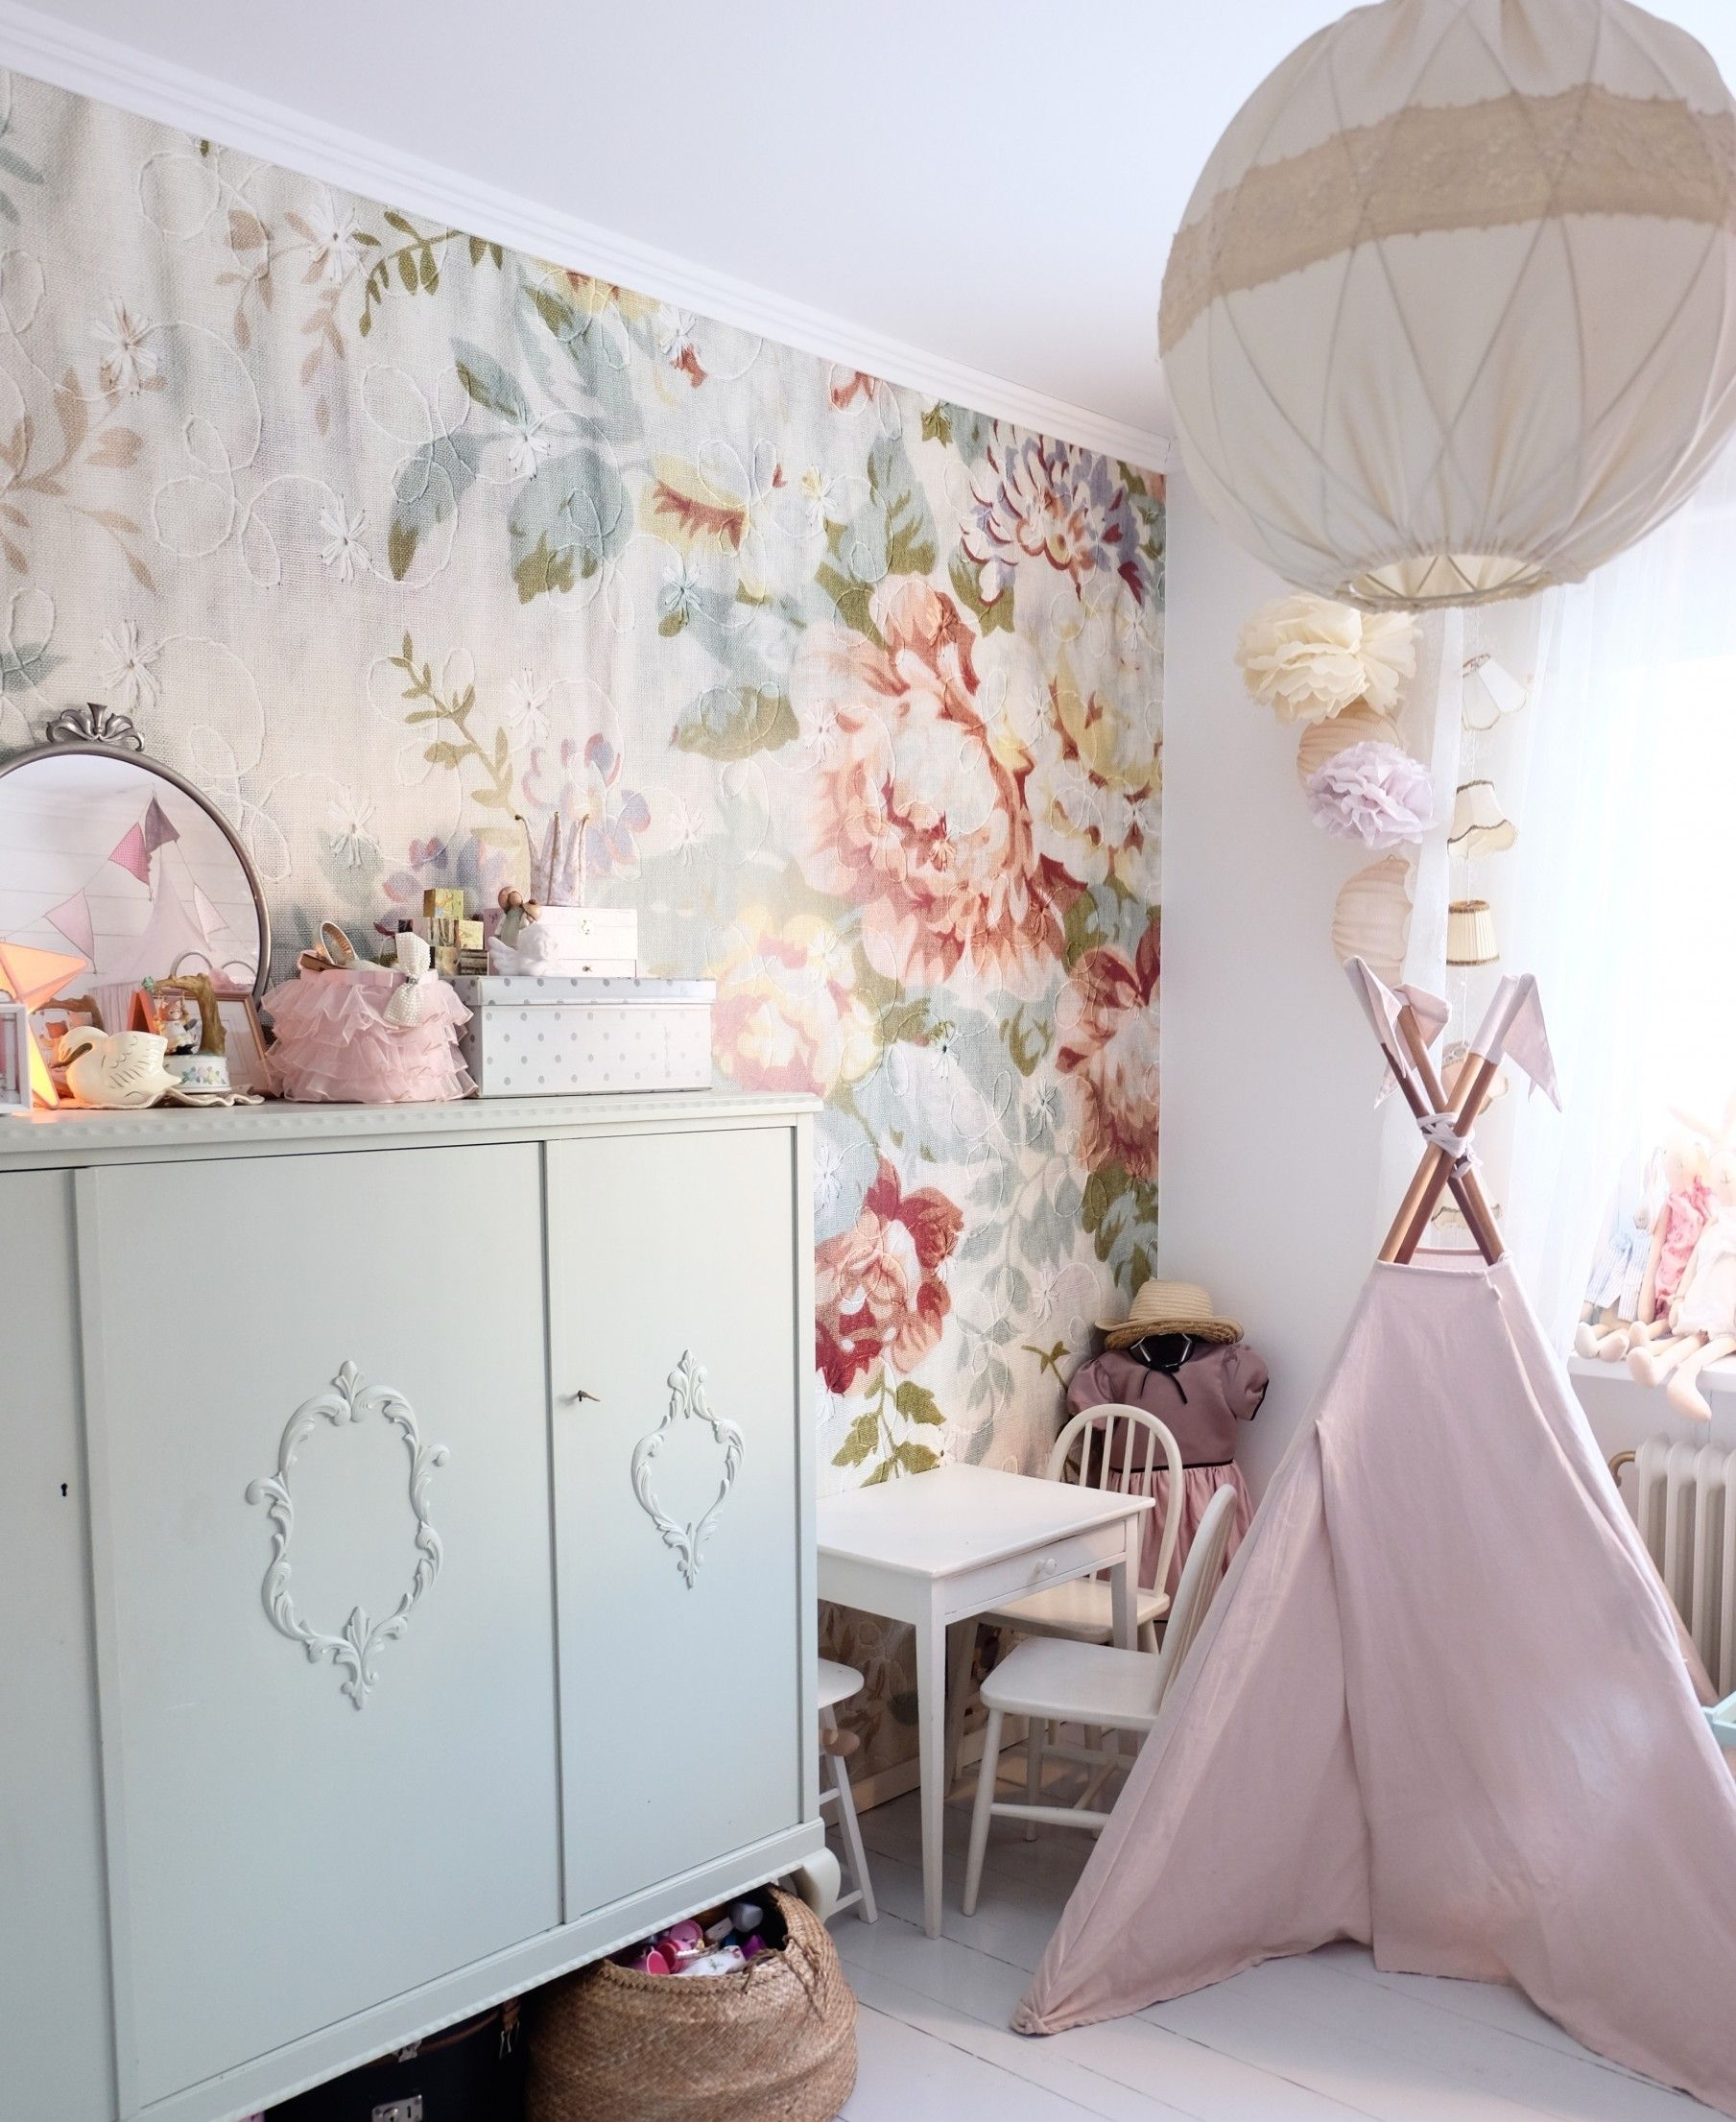 Wallpaper Blossom, Photo: Evenlina Hinds